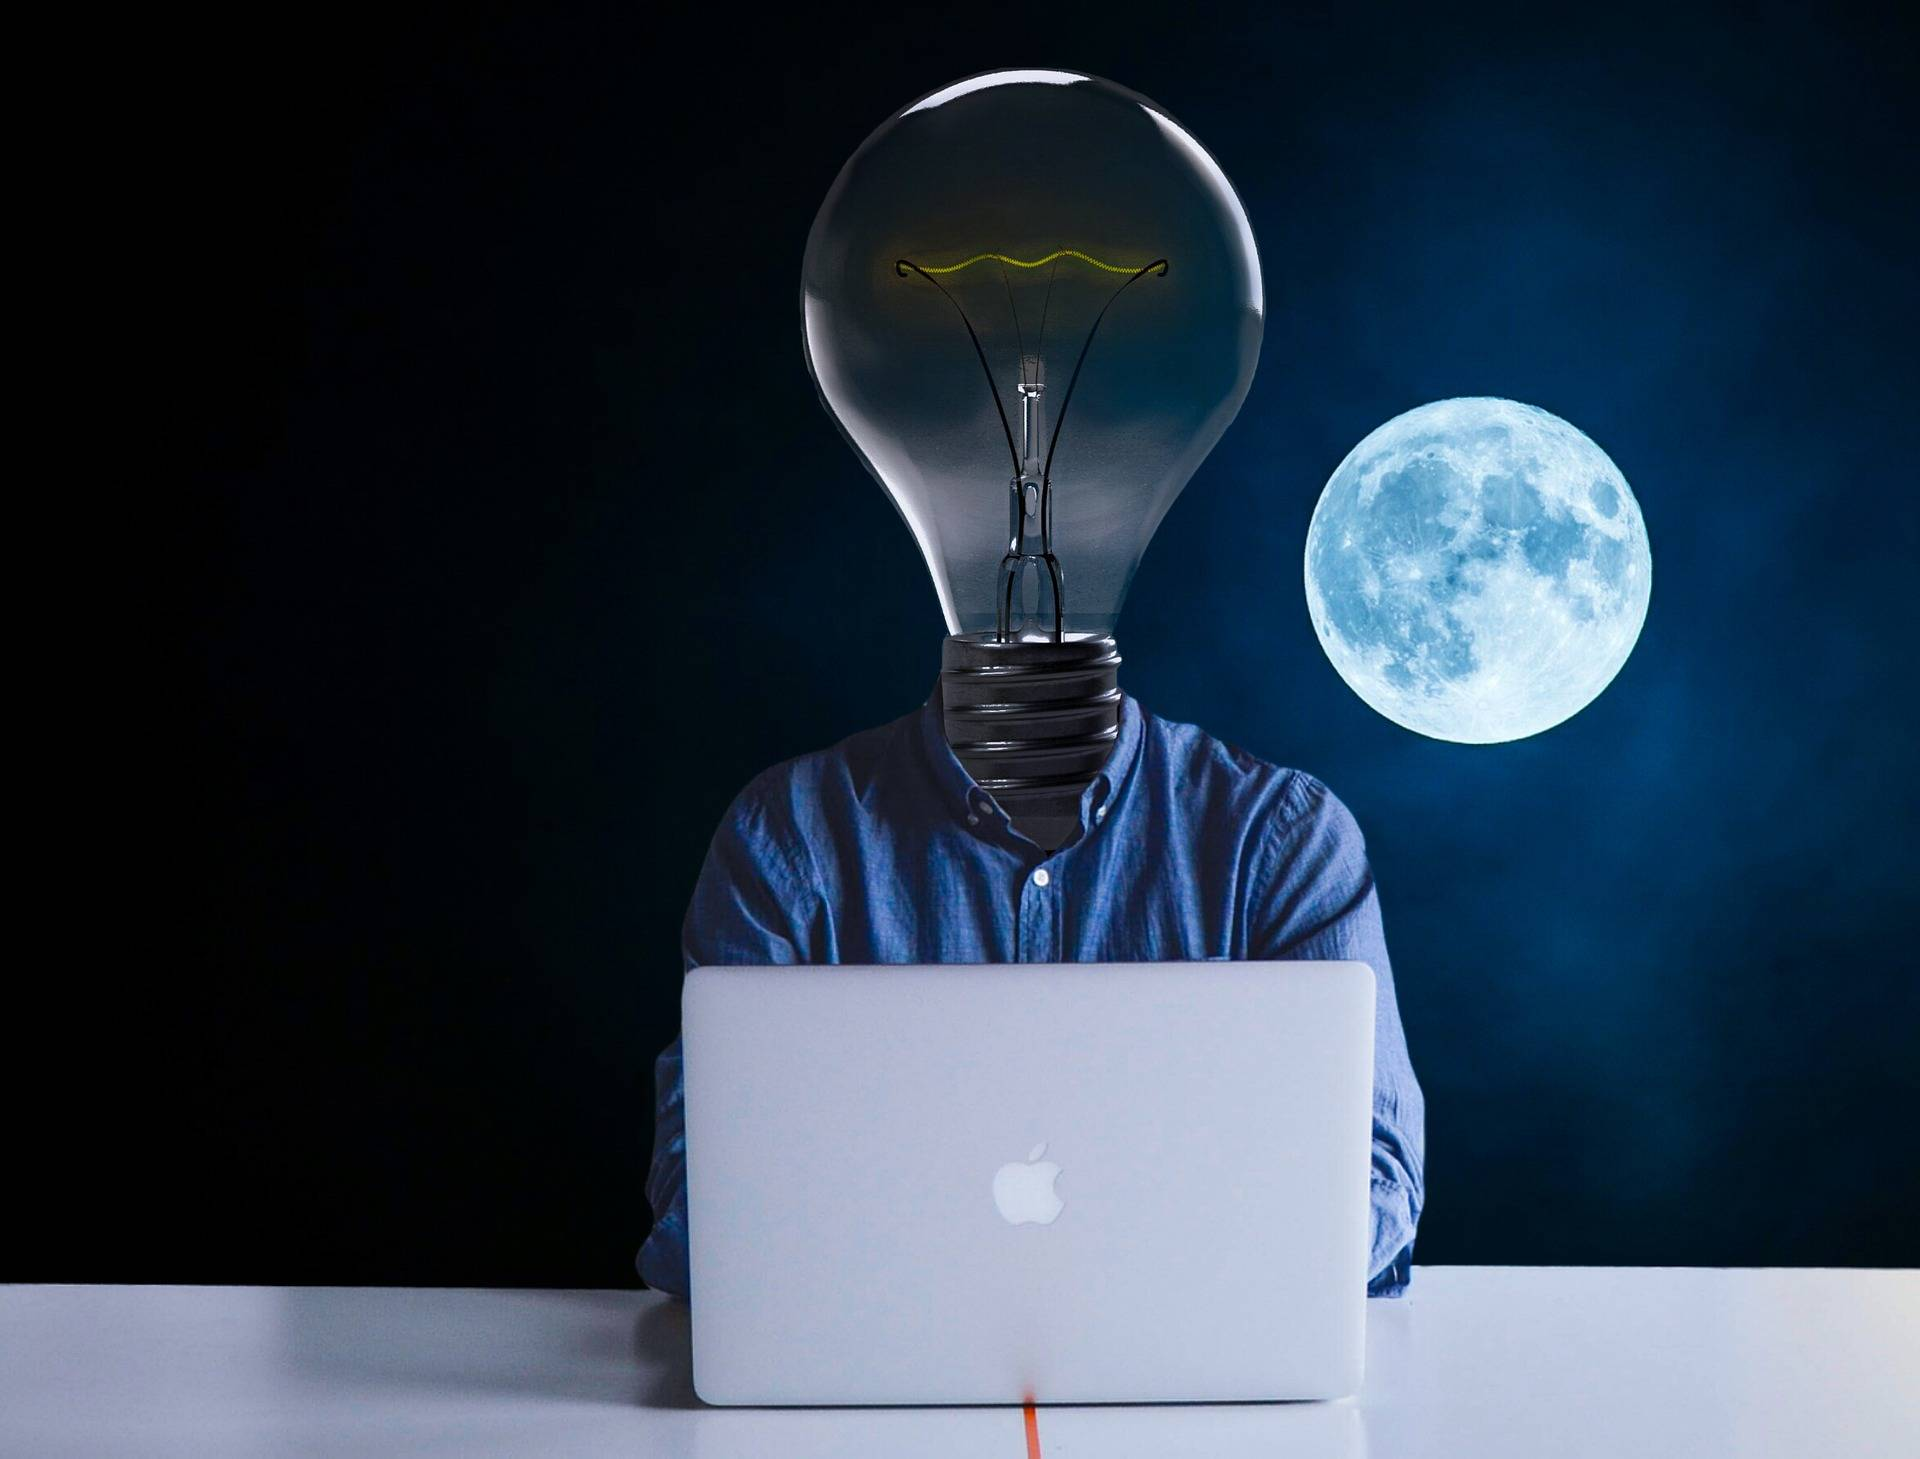 ordinateur-nuit-lune